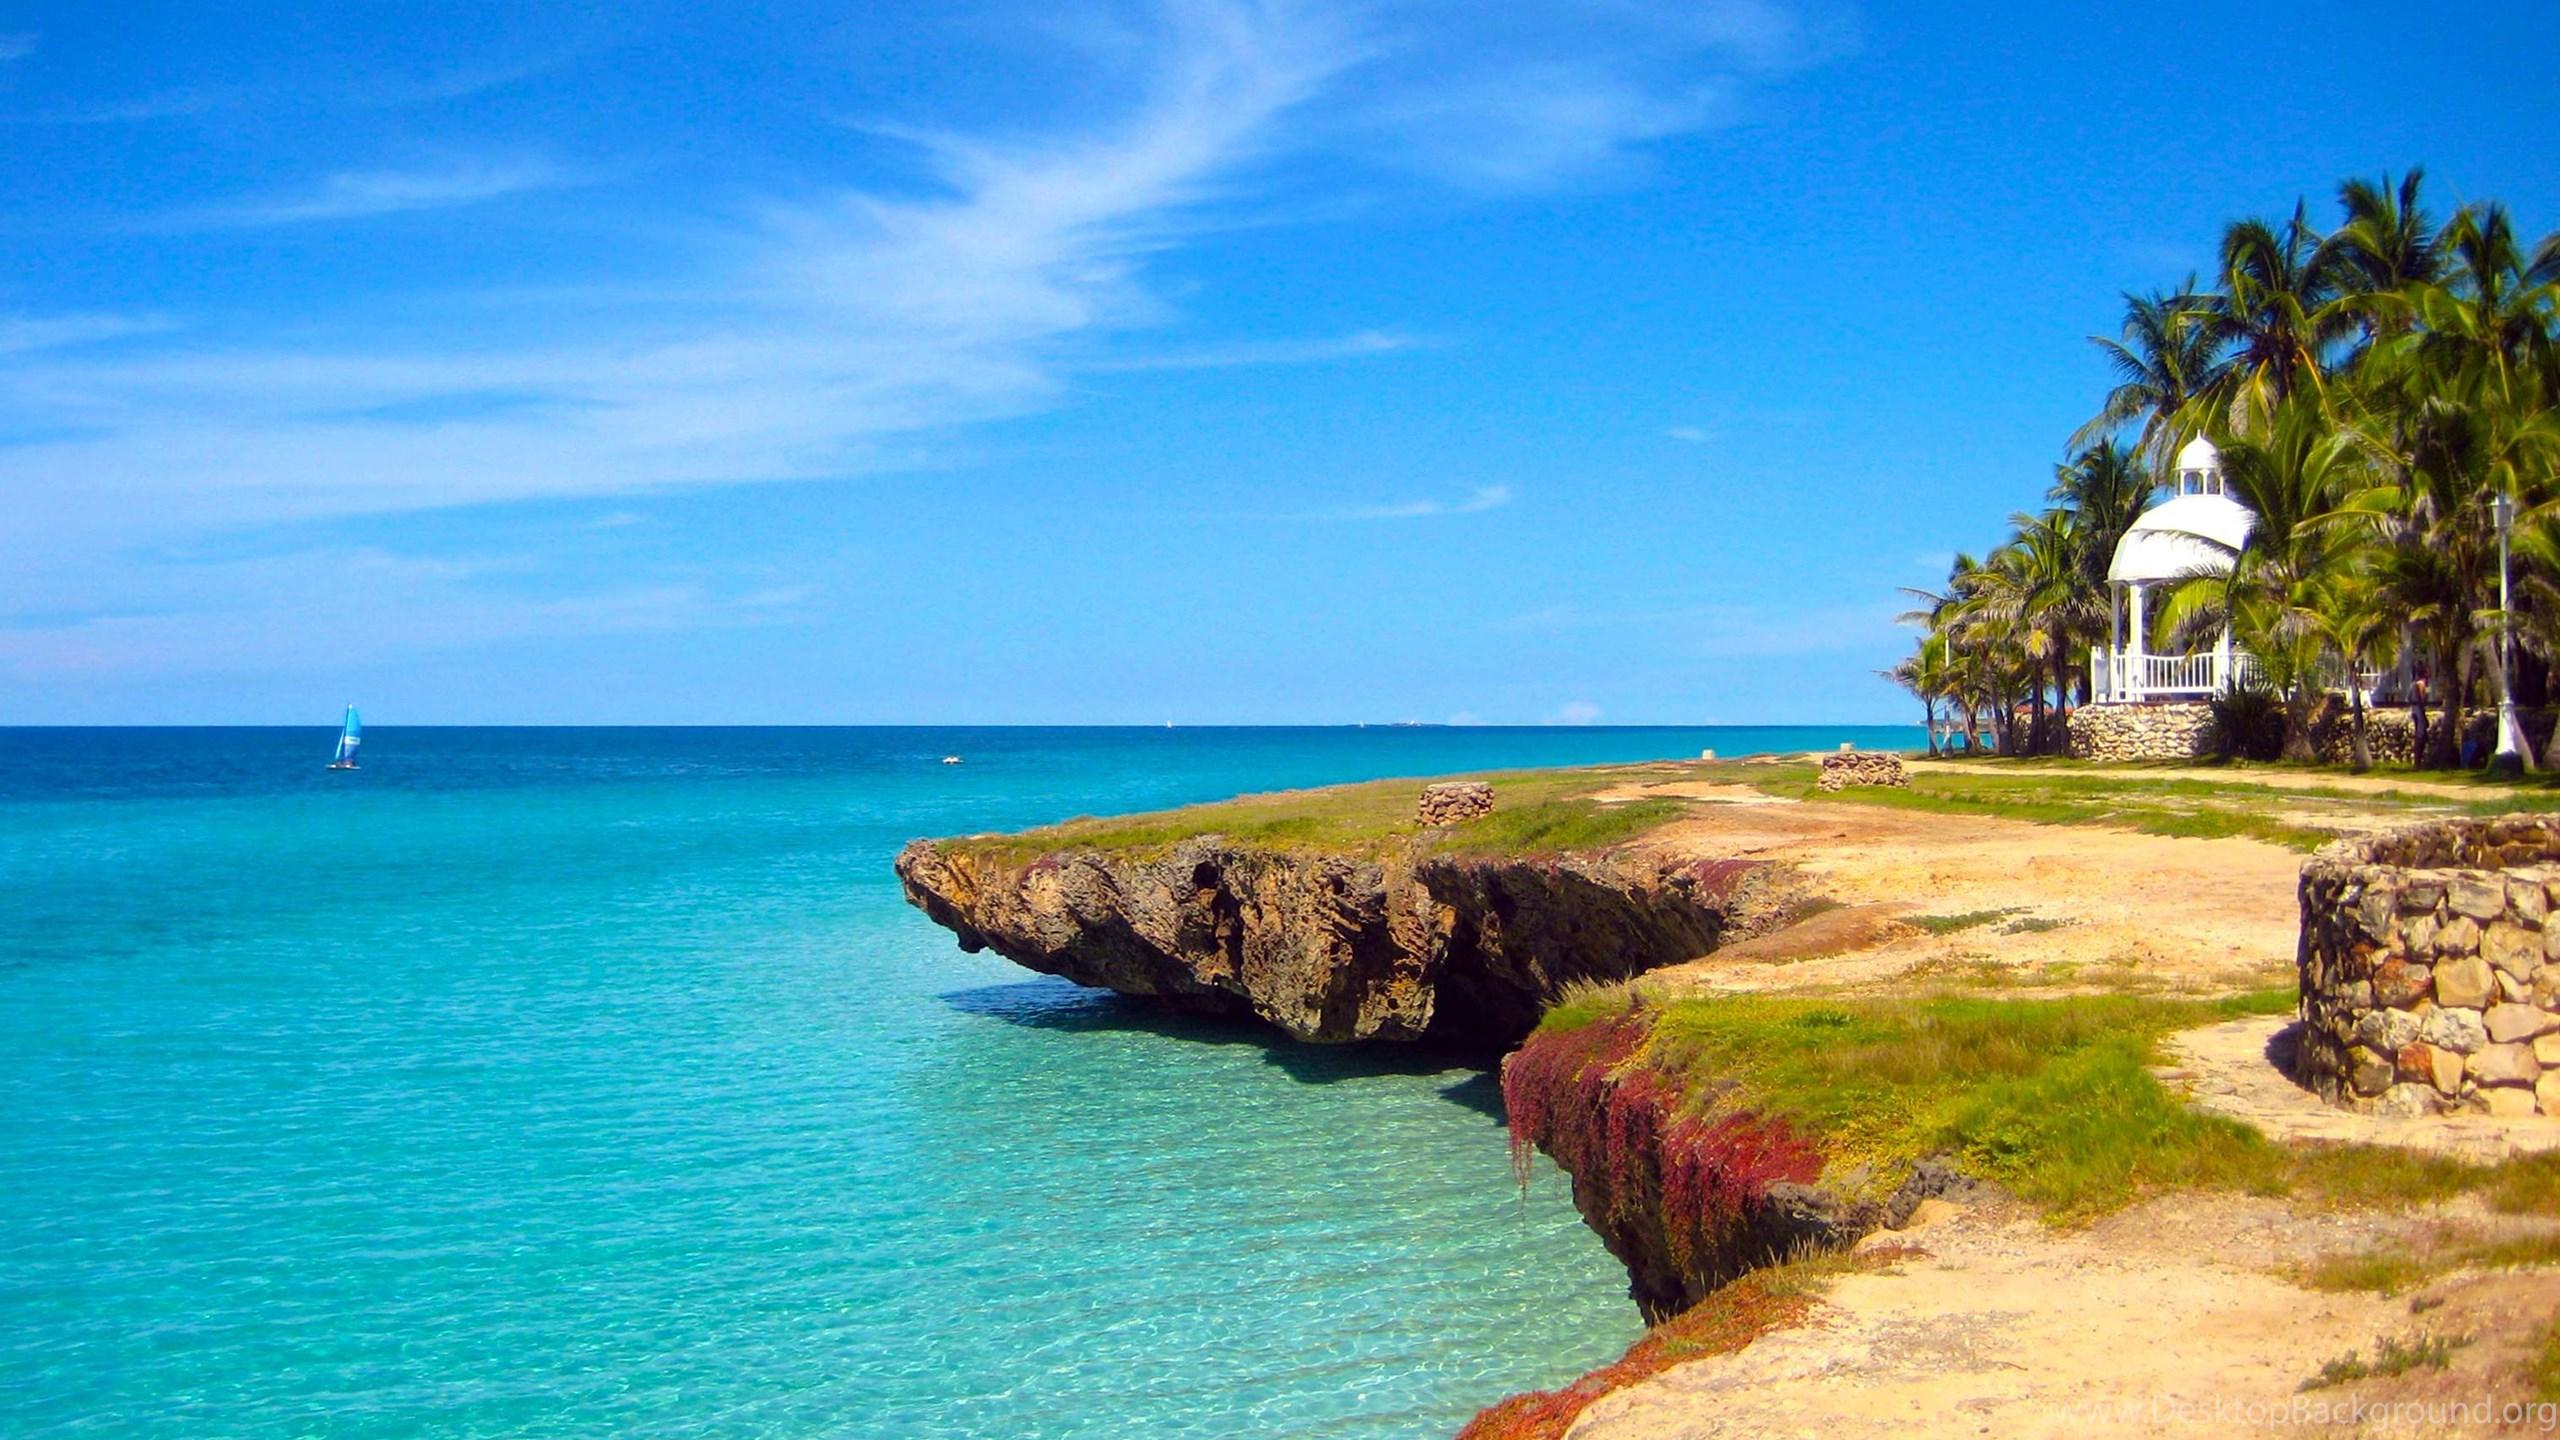 free caribbean beach wallpapers wallpapers cave desktop background